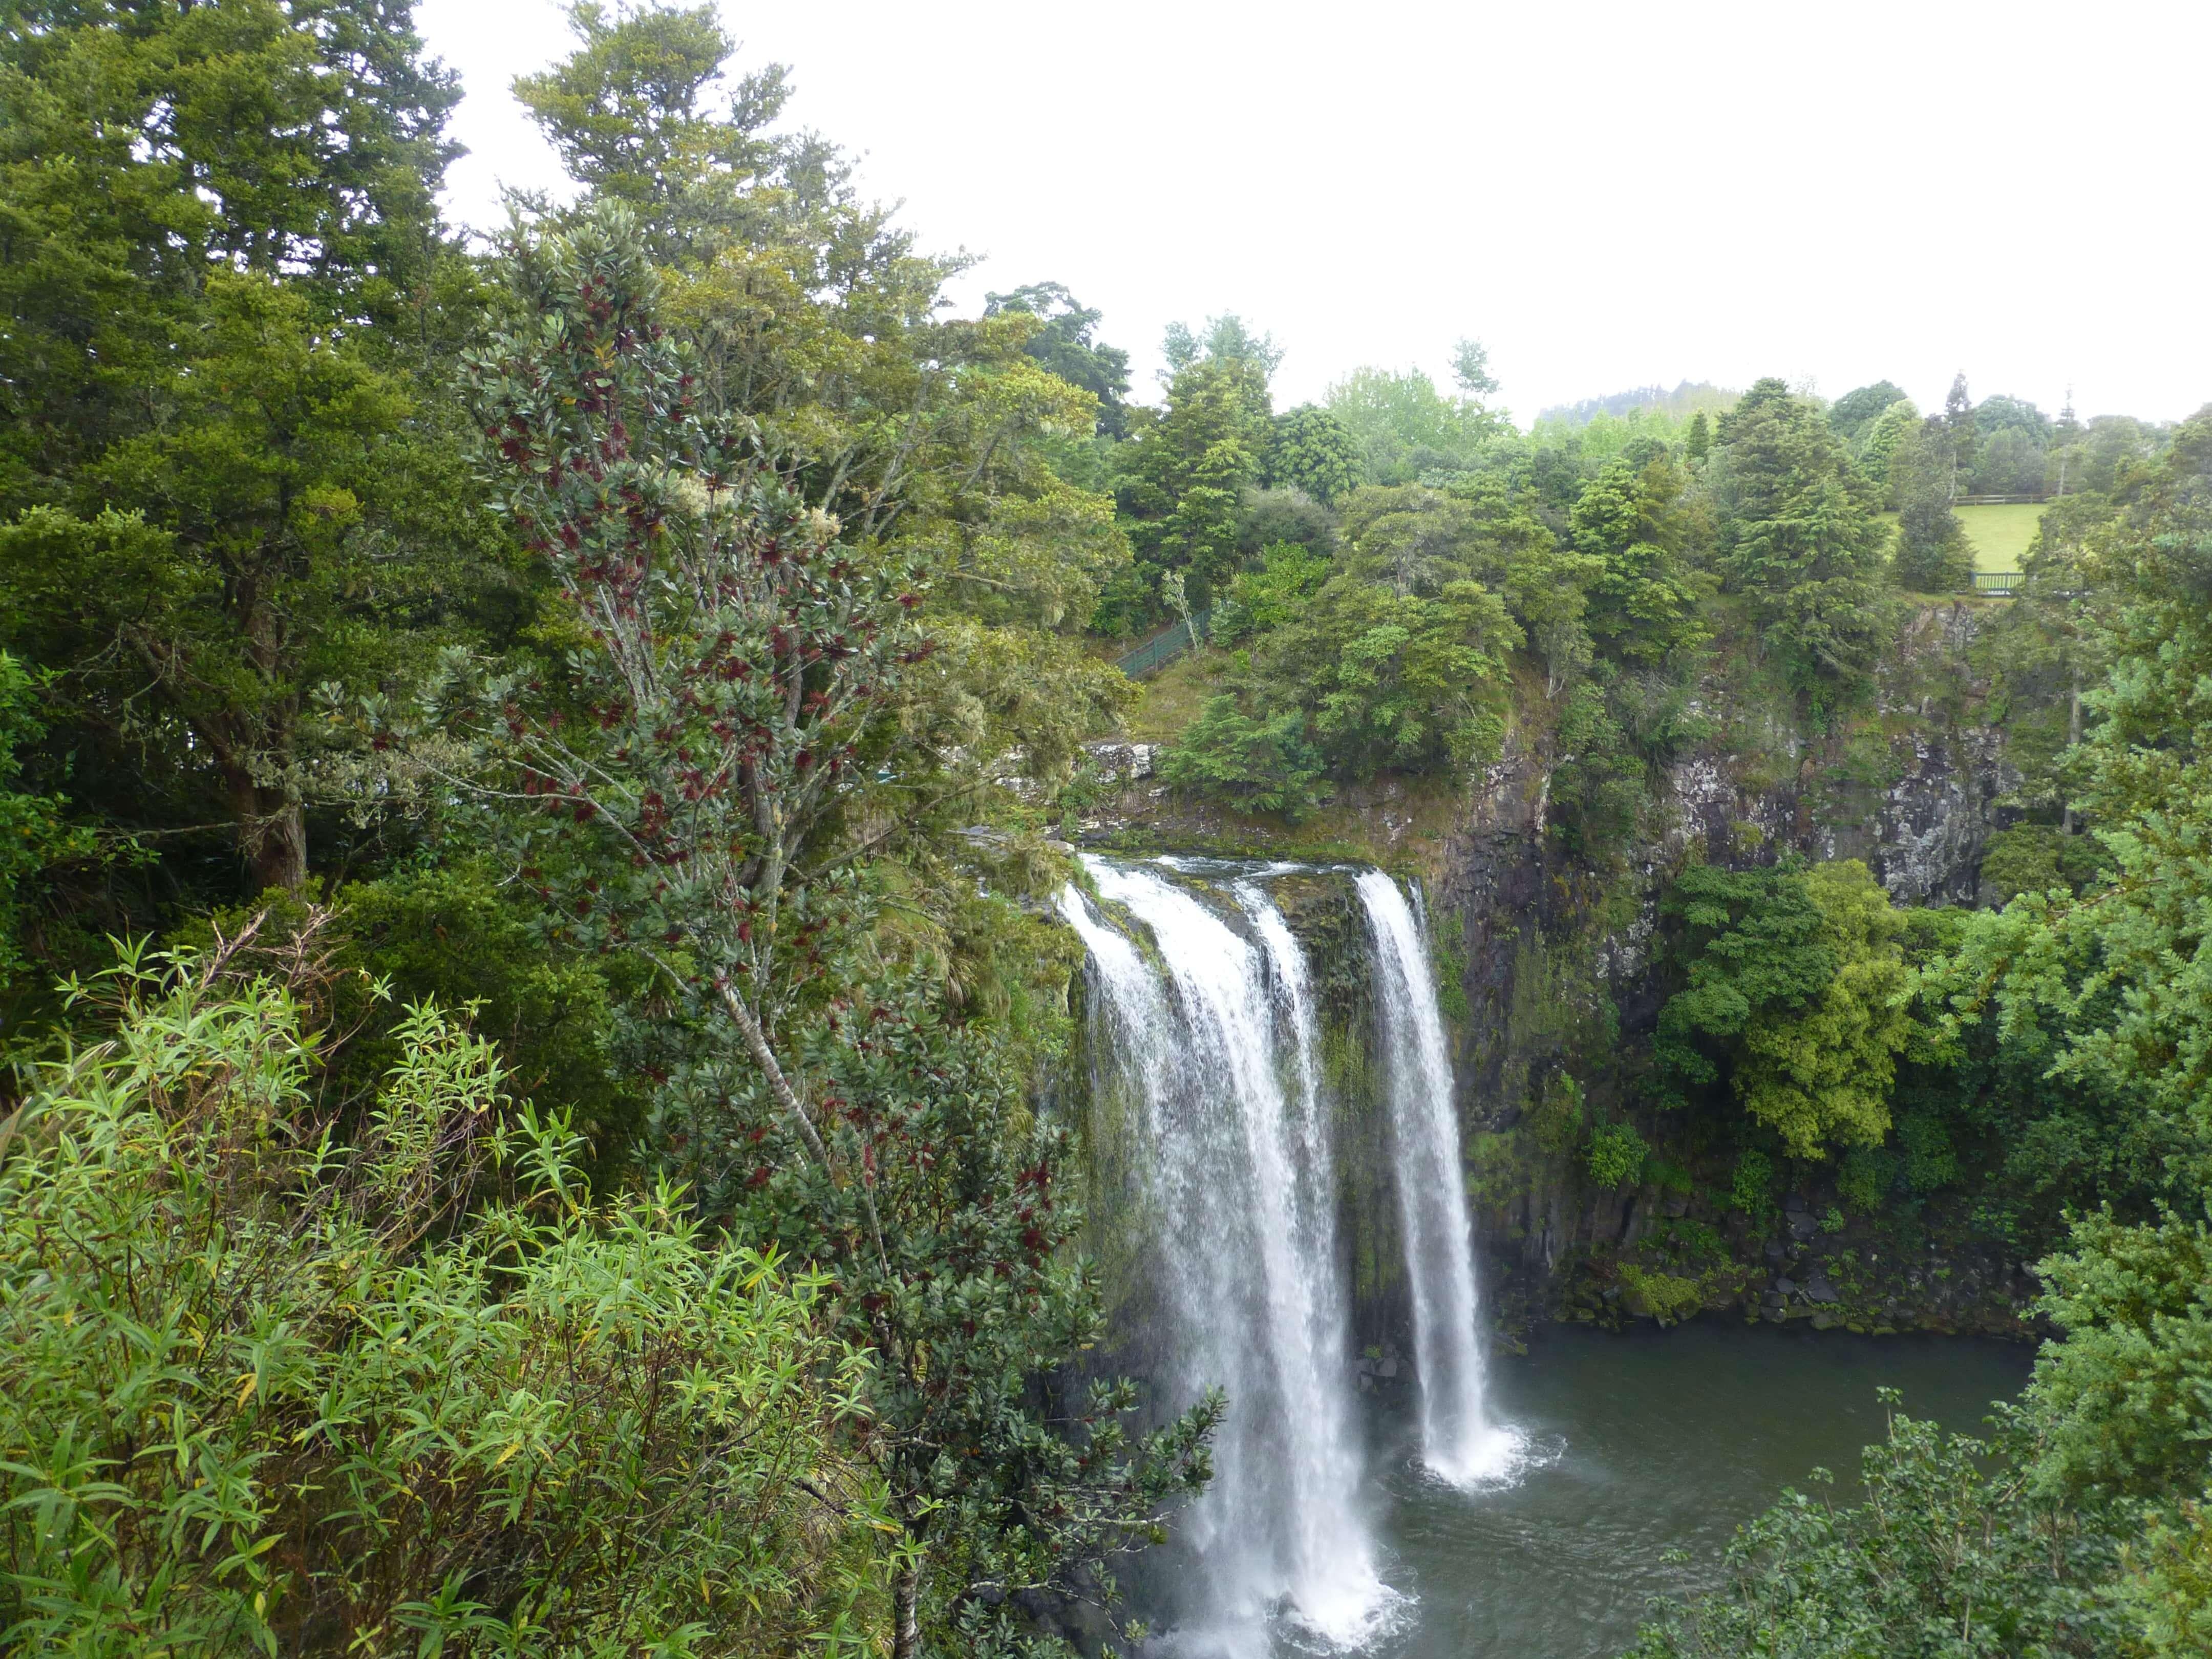 Weit weg Reisen, Whangarei Falls, Neuseeland 2